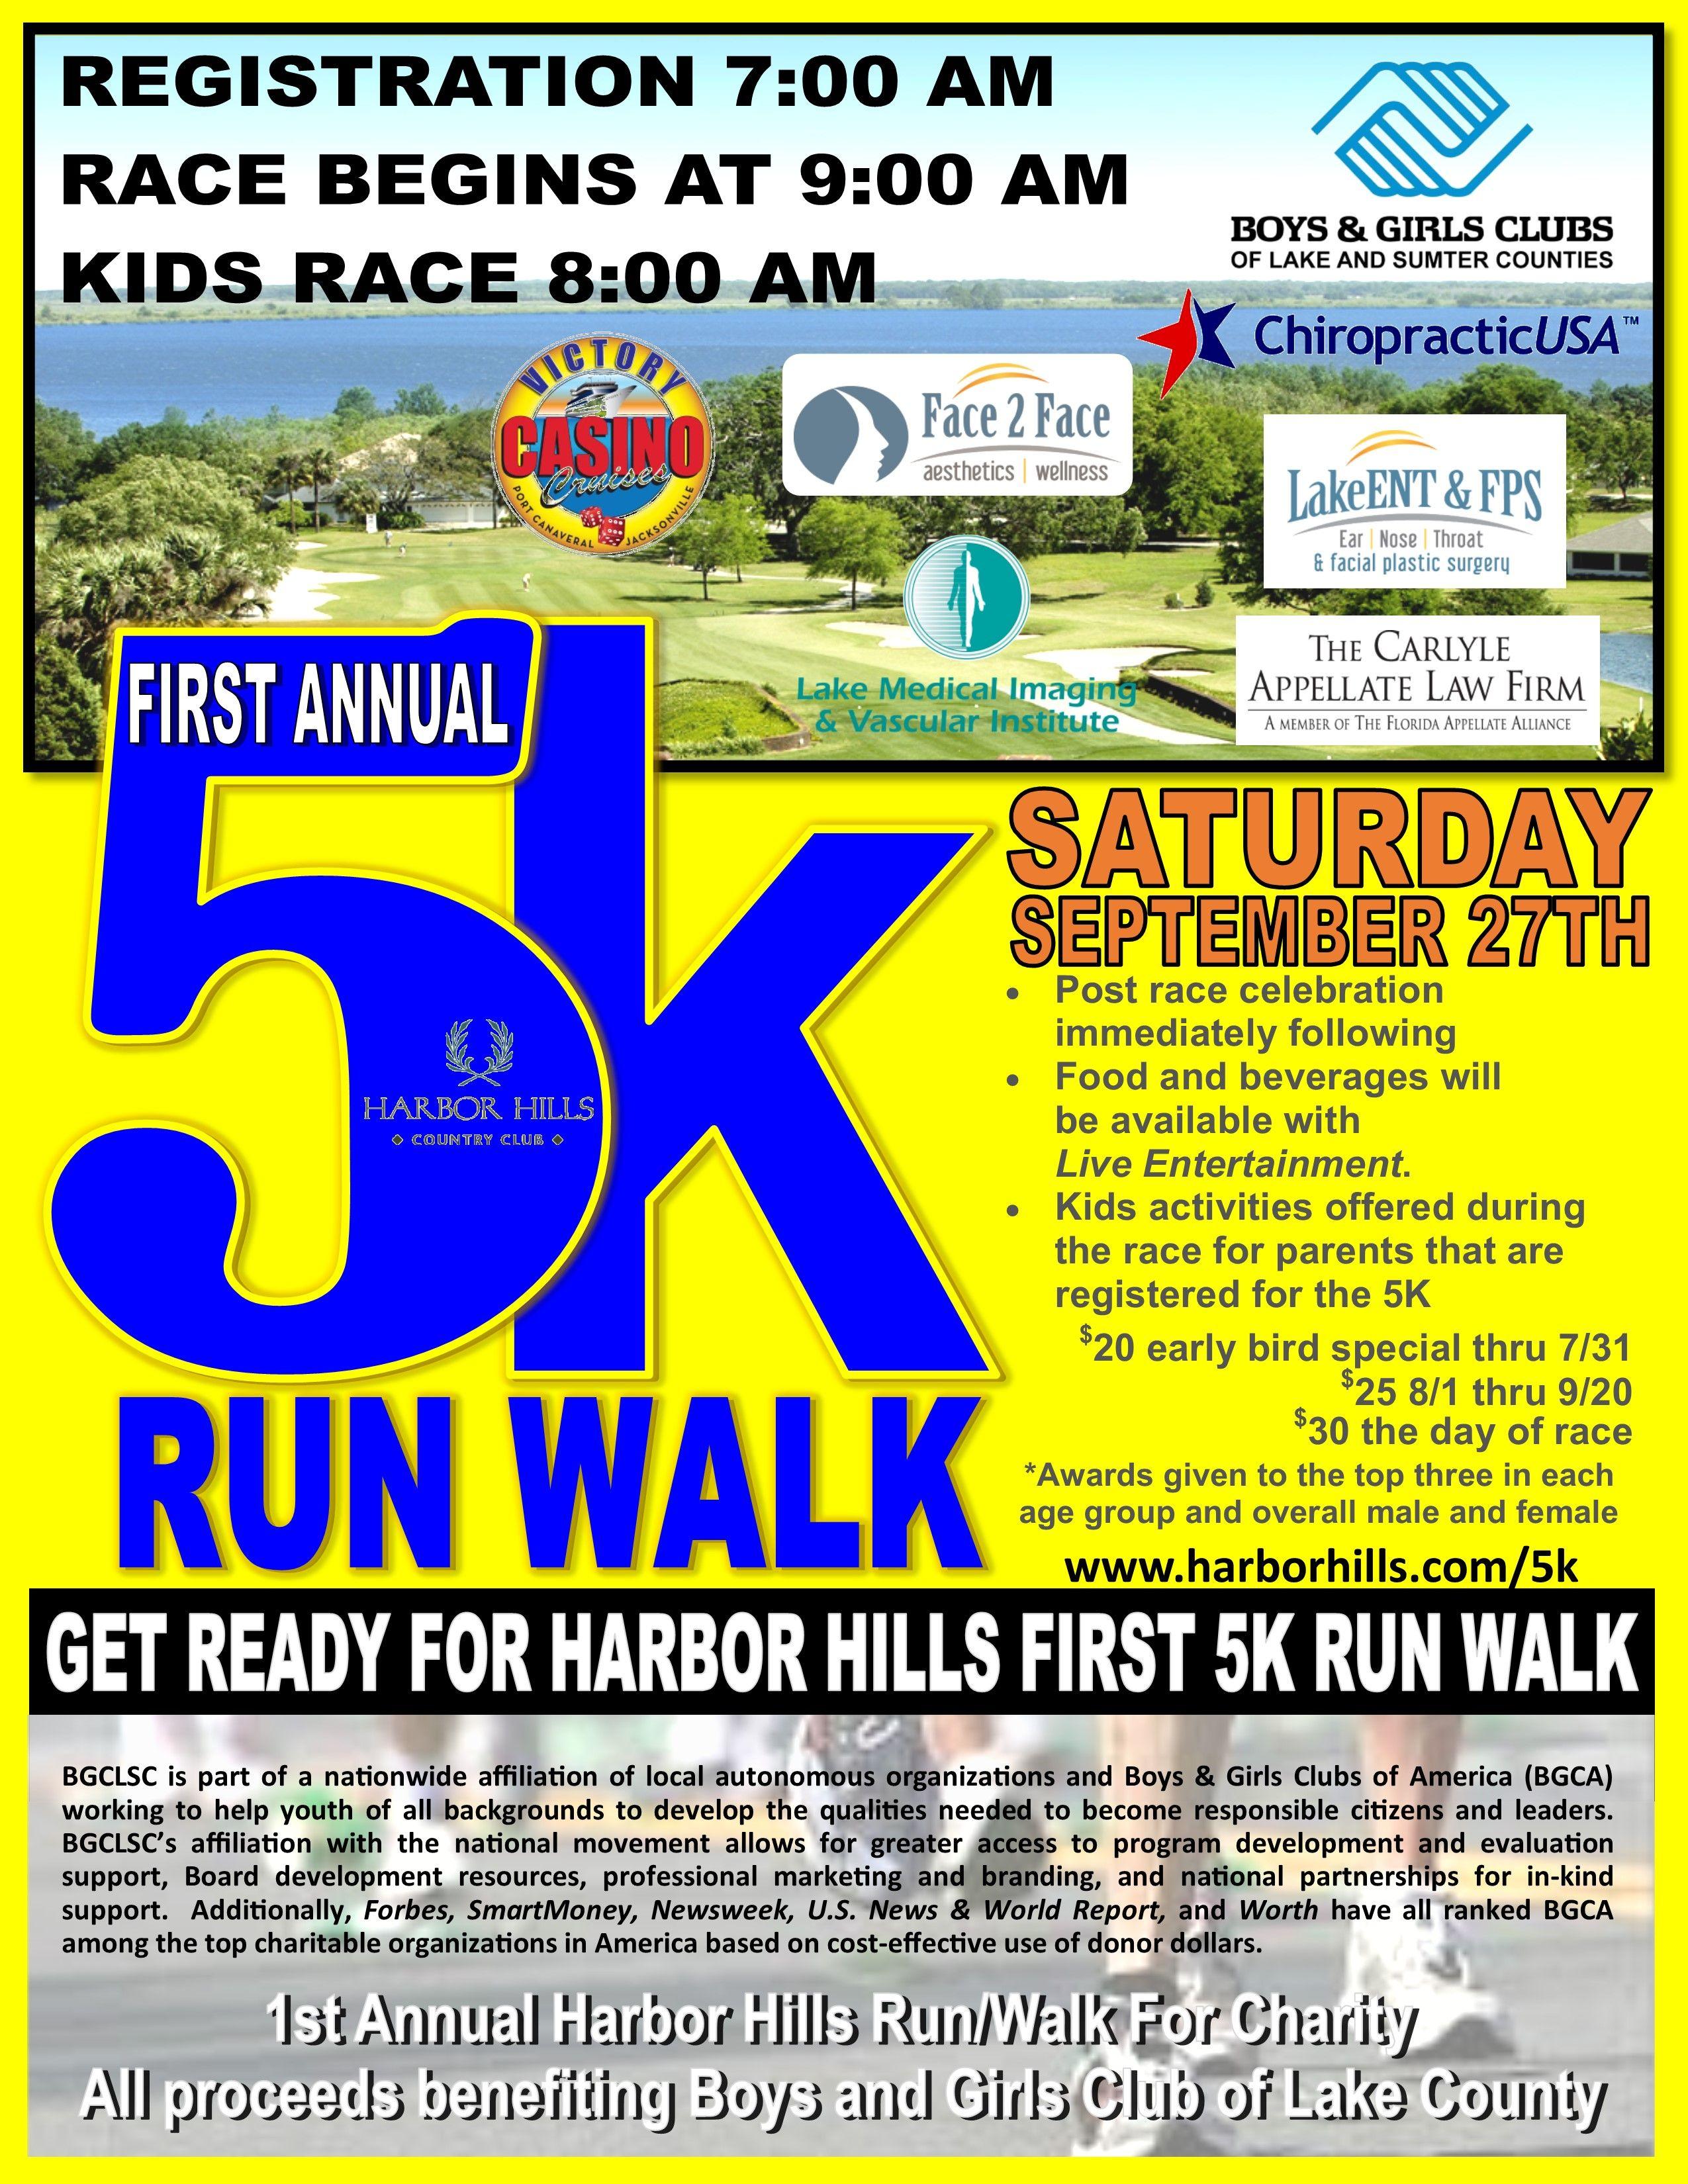 5k runwalk summerfun (With images) Kids races, Sumter